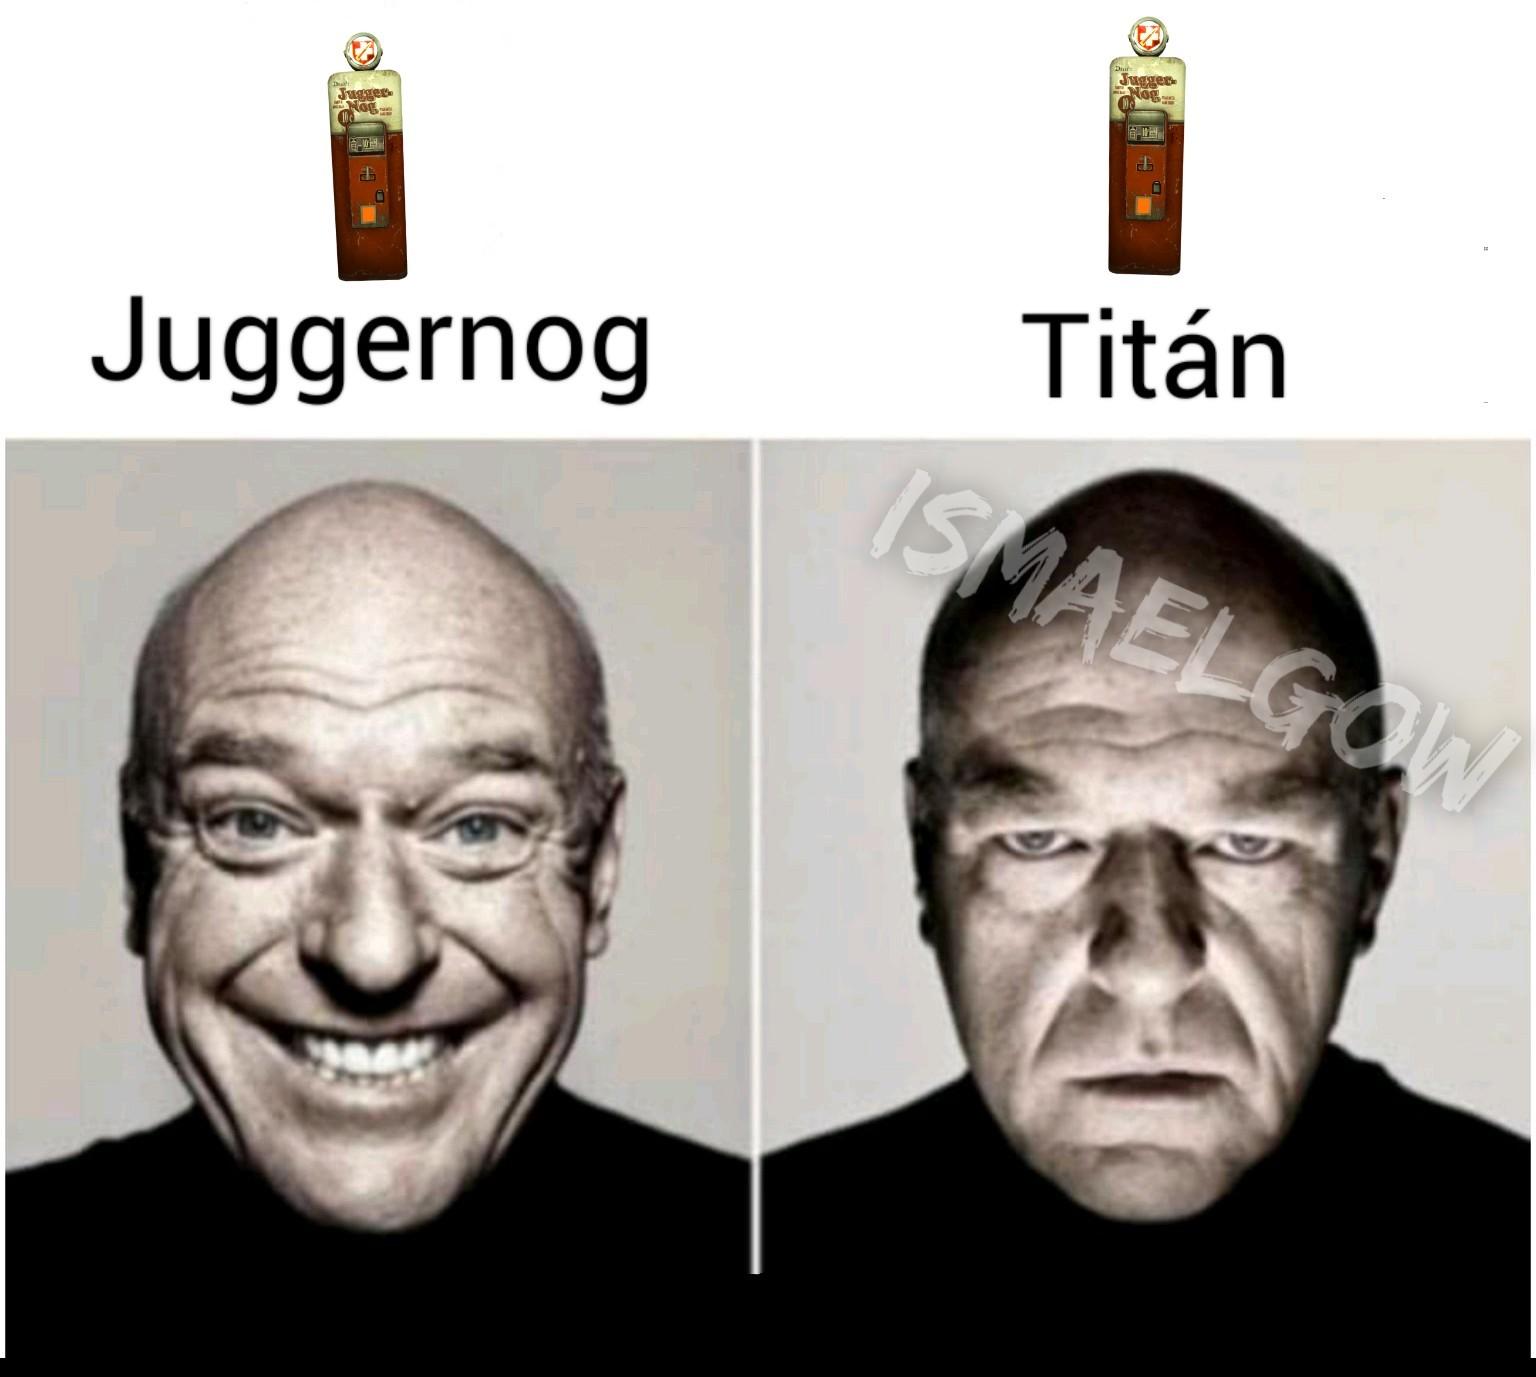 Juggernog. - meme